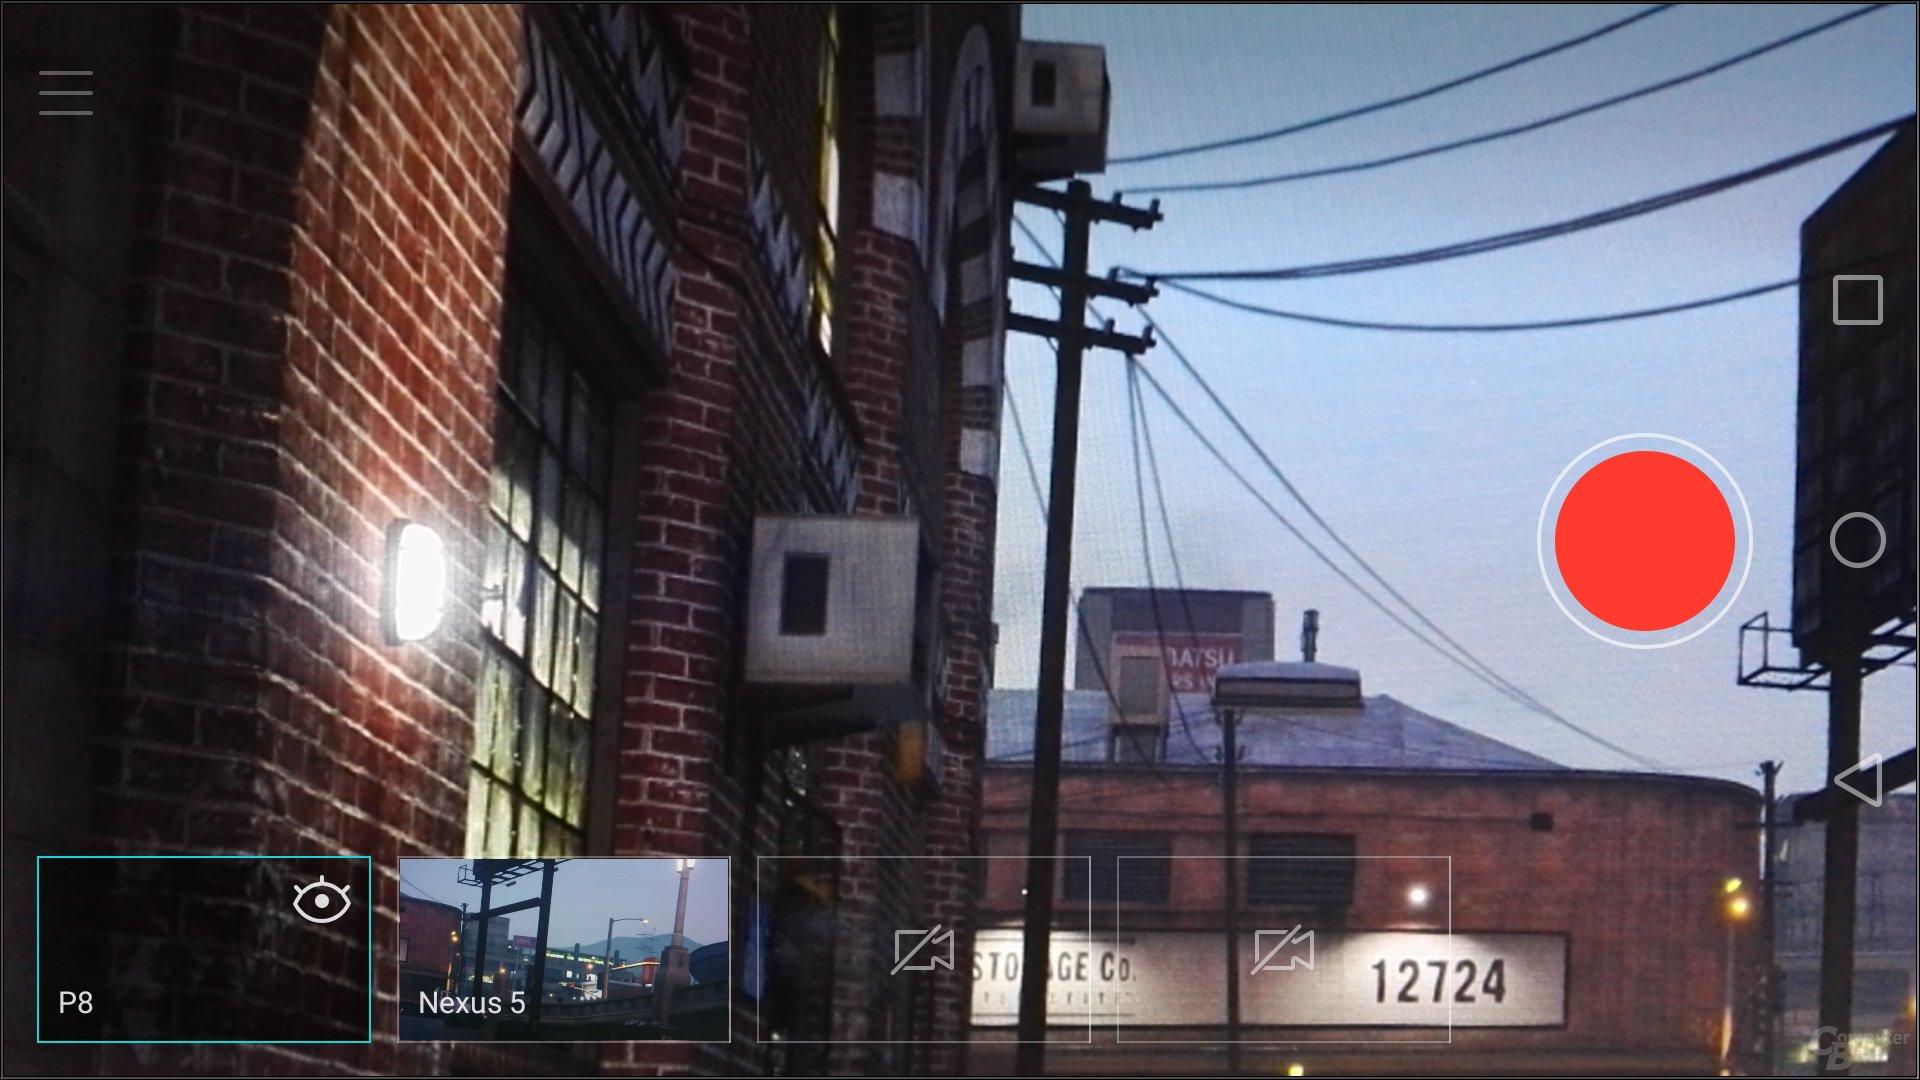 Regisseur-Modus – Mit verbundenem Nexus 5